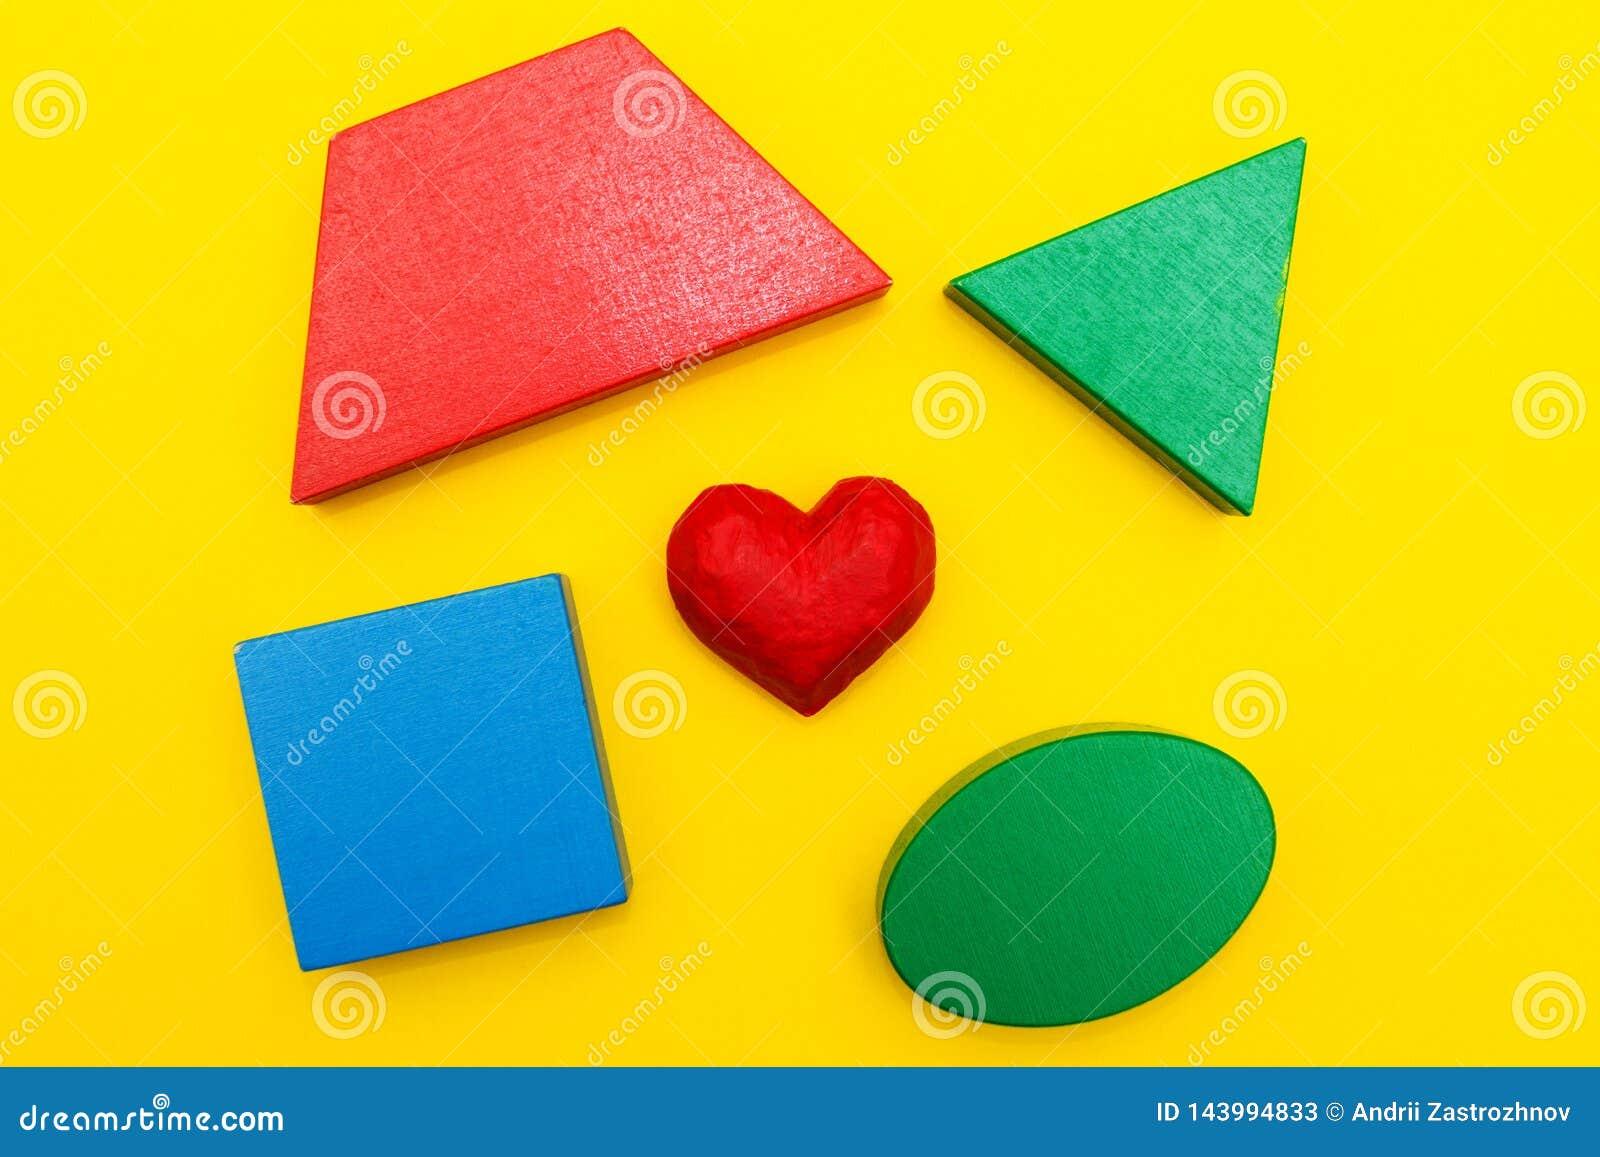 Postacie i serce na żółtym tle